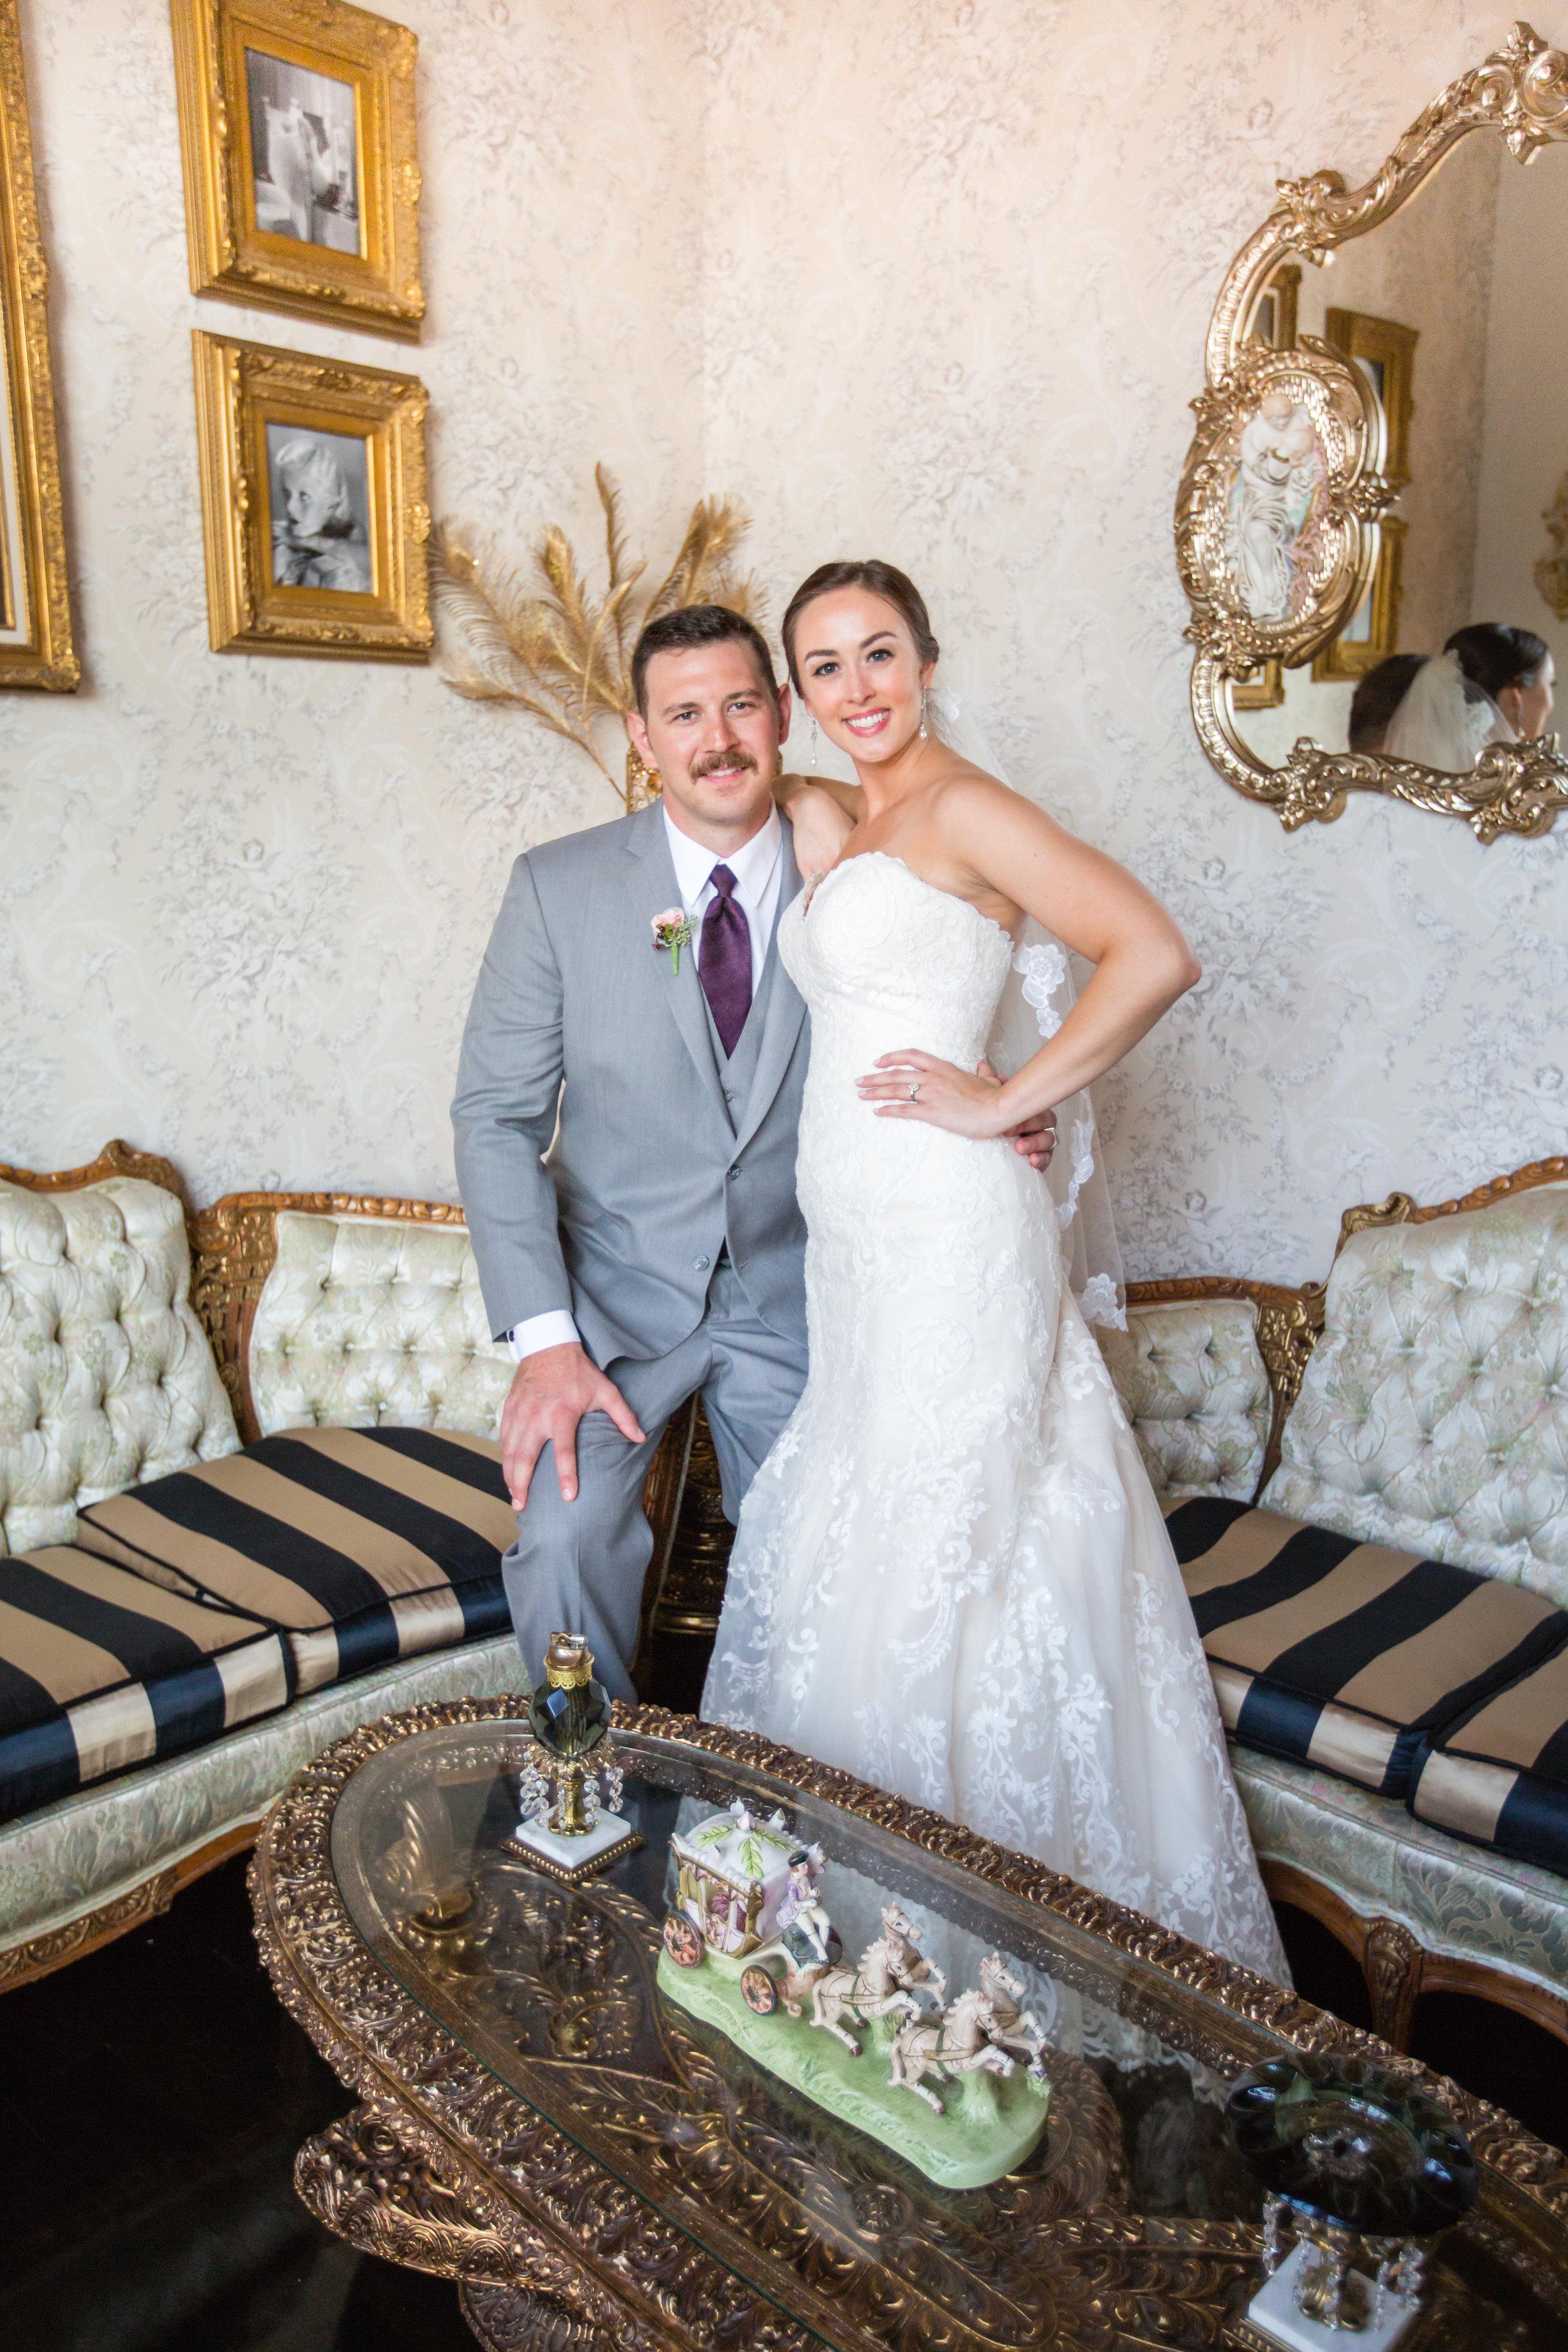 Courtney-Andy-Wedding-Blog-75.jpg